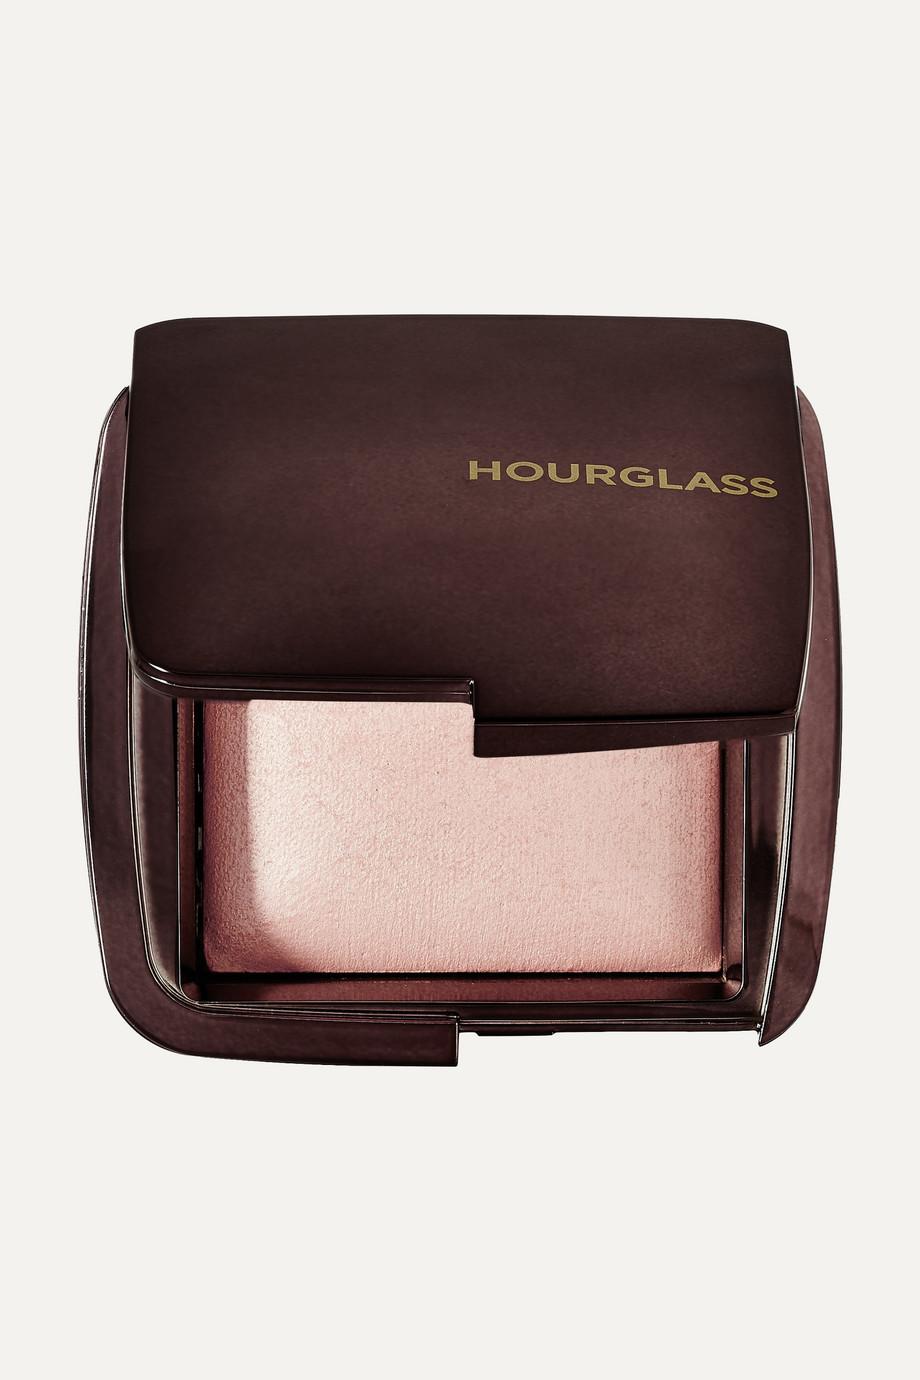 Hourglass Ambient Lighting Powder - Dim Light